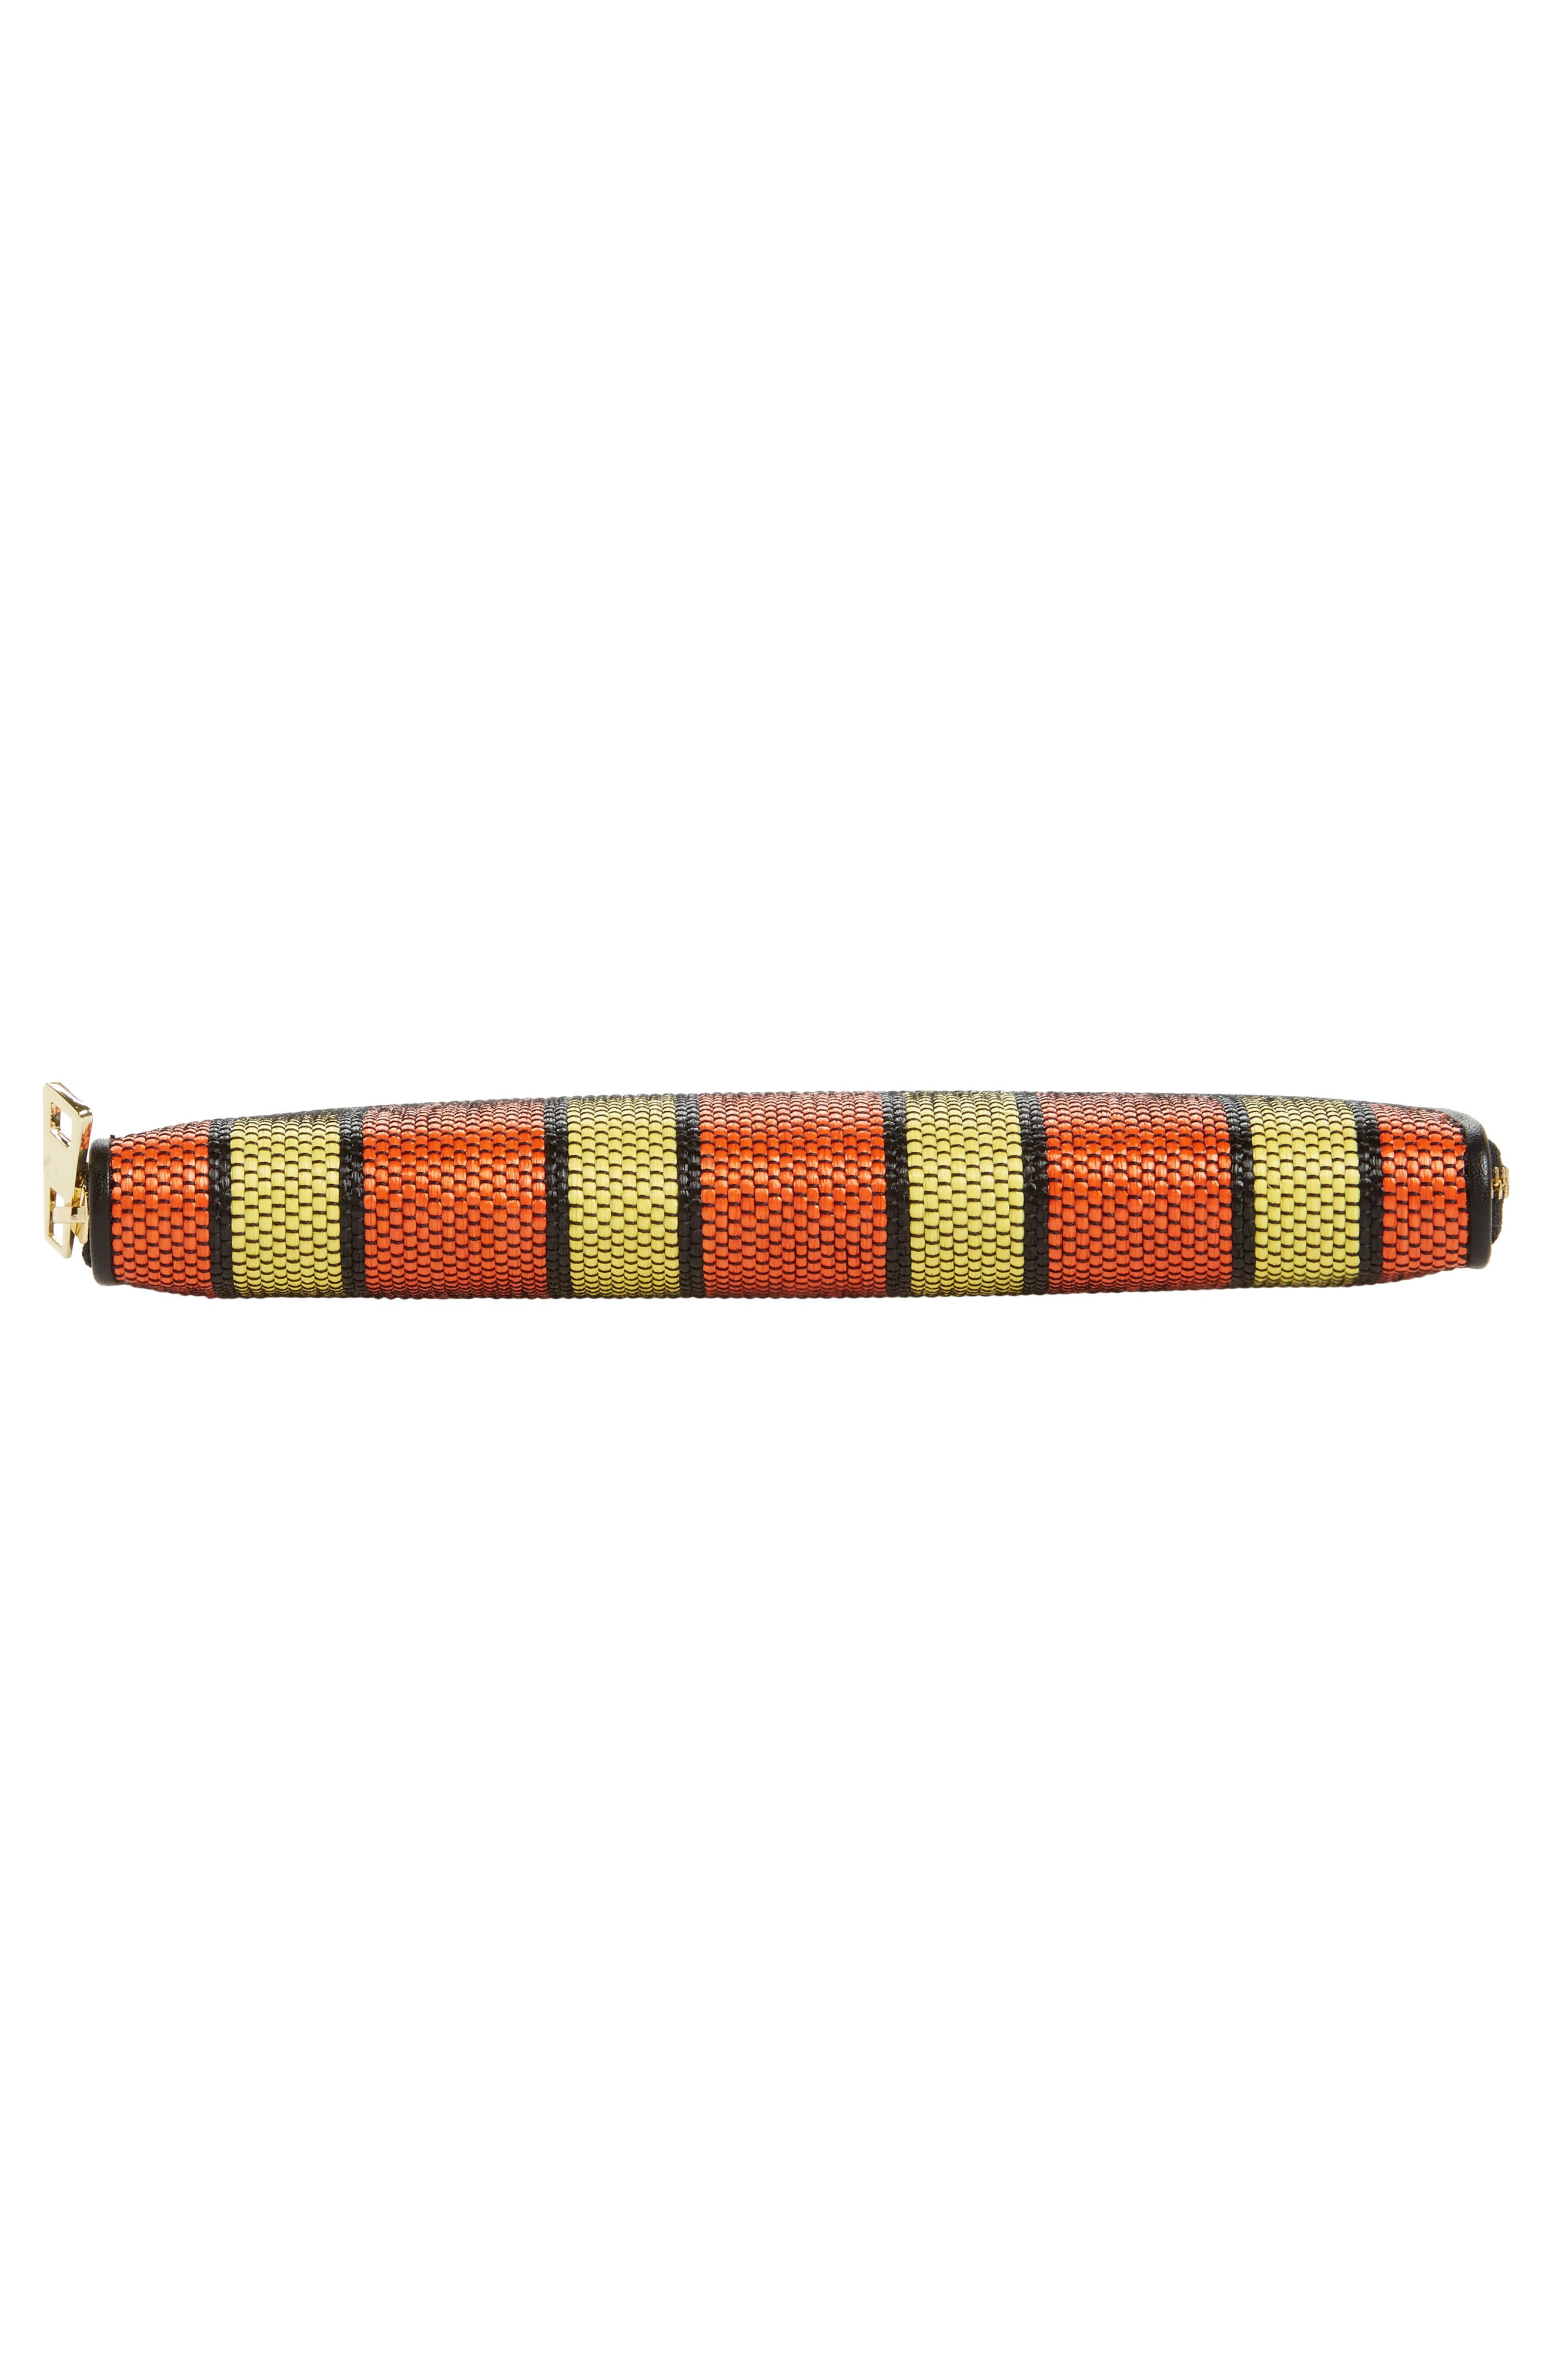 Raffia Continental Zip Wallet,                             Alternate thumbnail 6, color,                             Orange/ Yellow/ Black